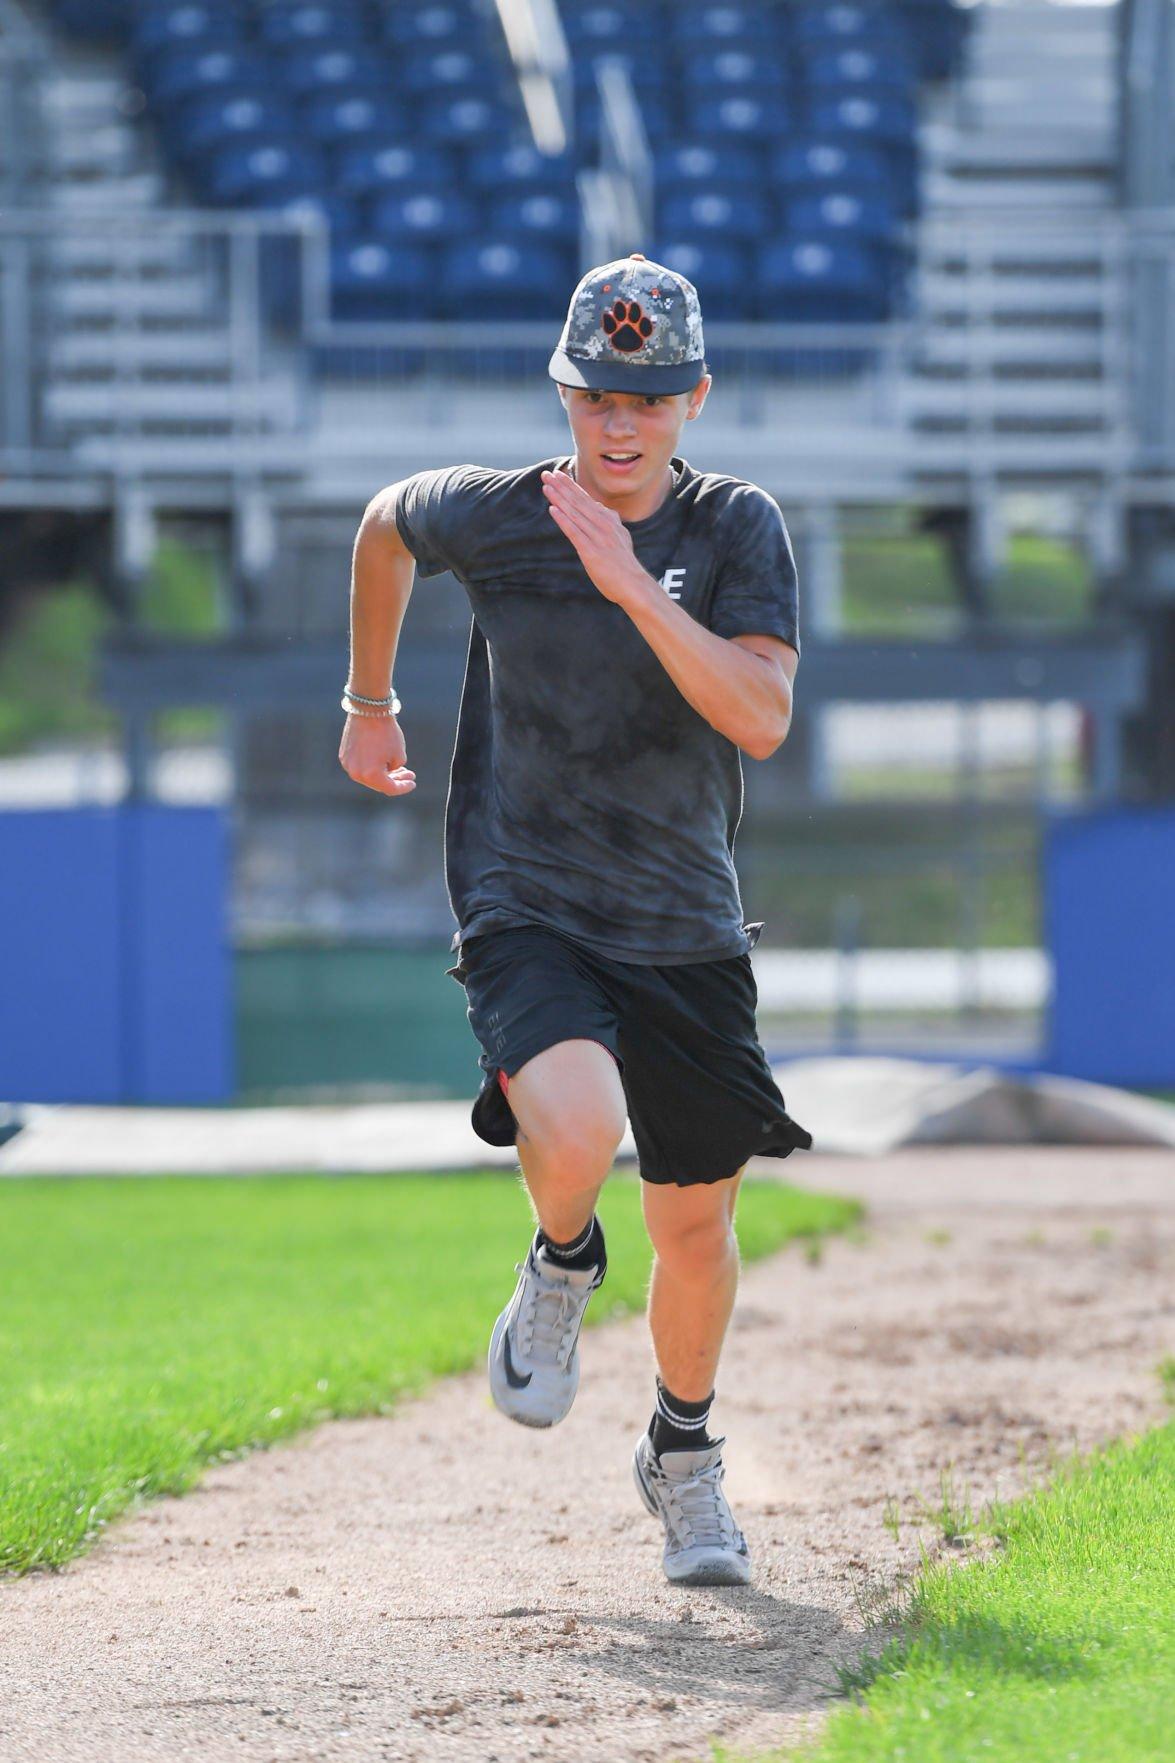 PSHS Baseball-hustle to first.jpg